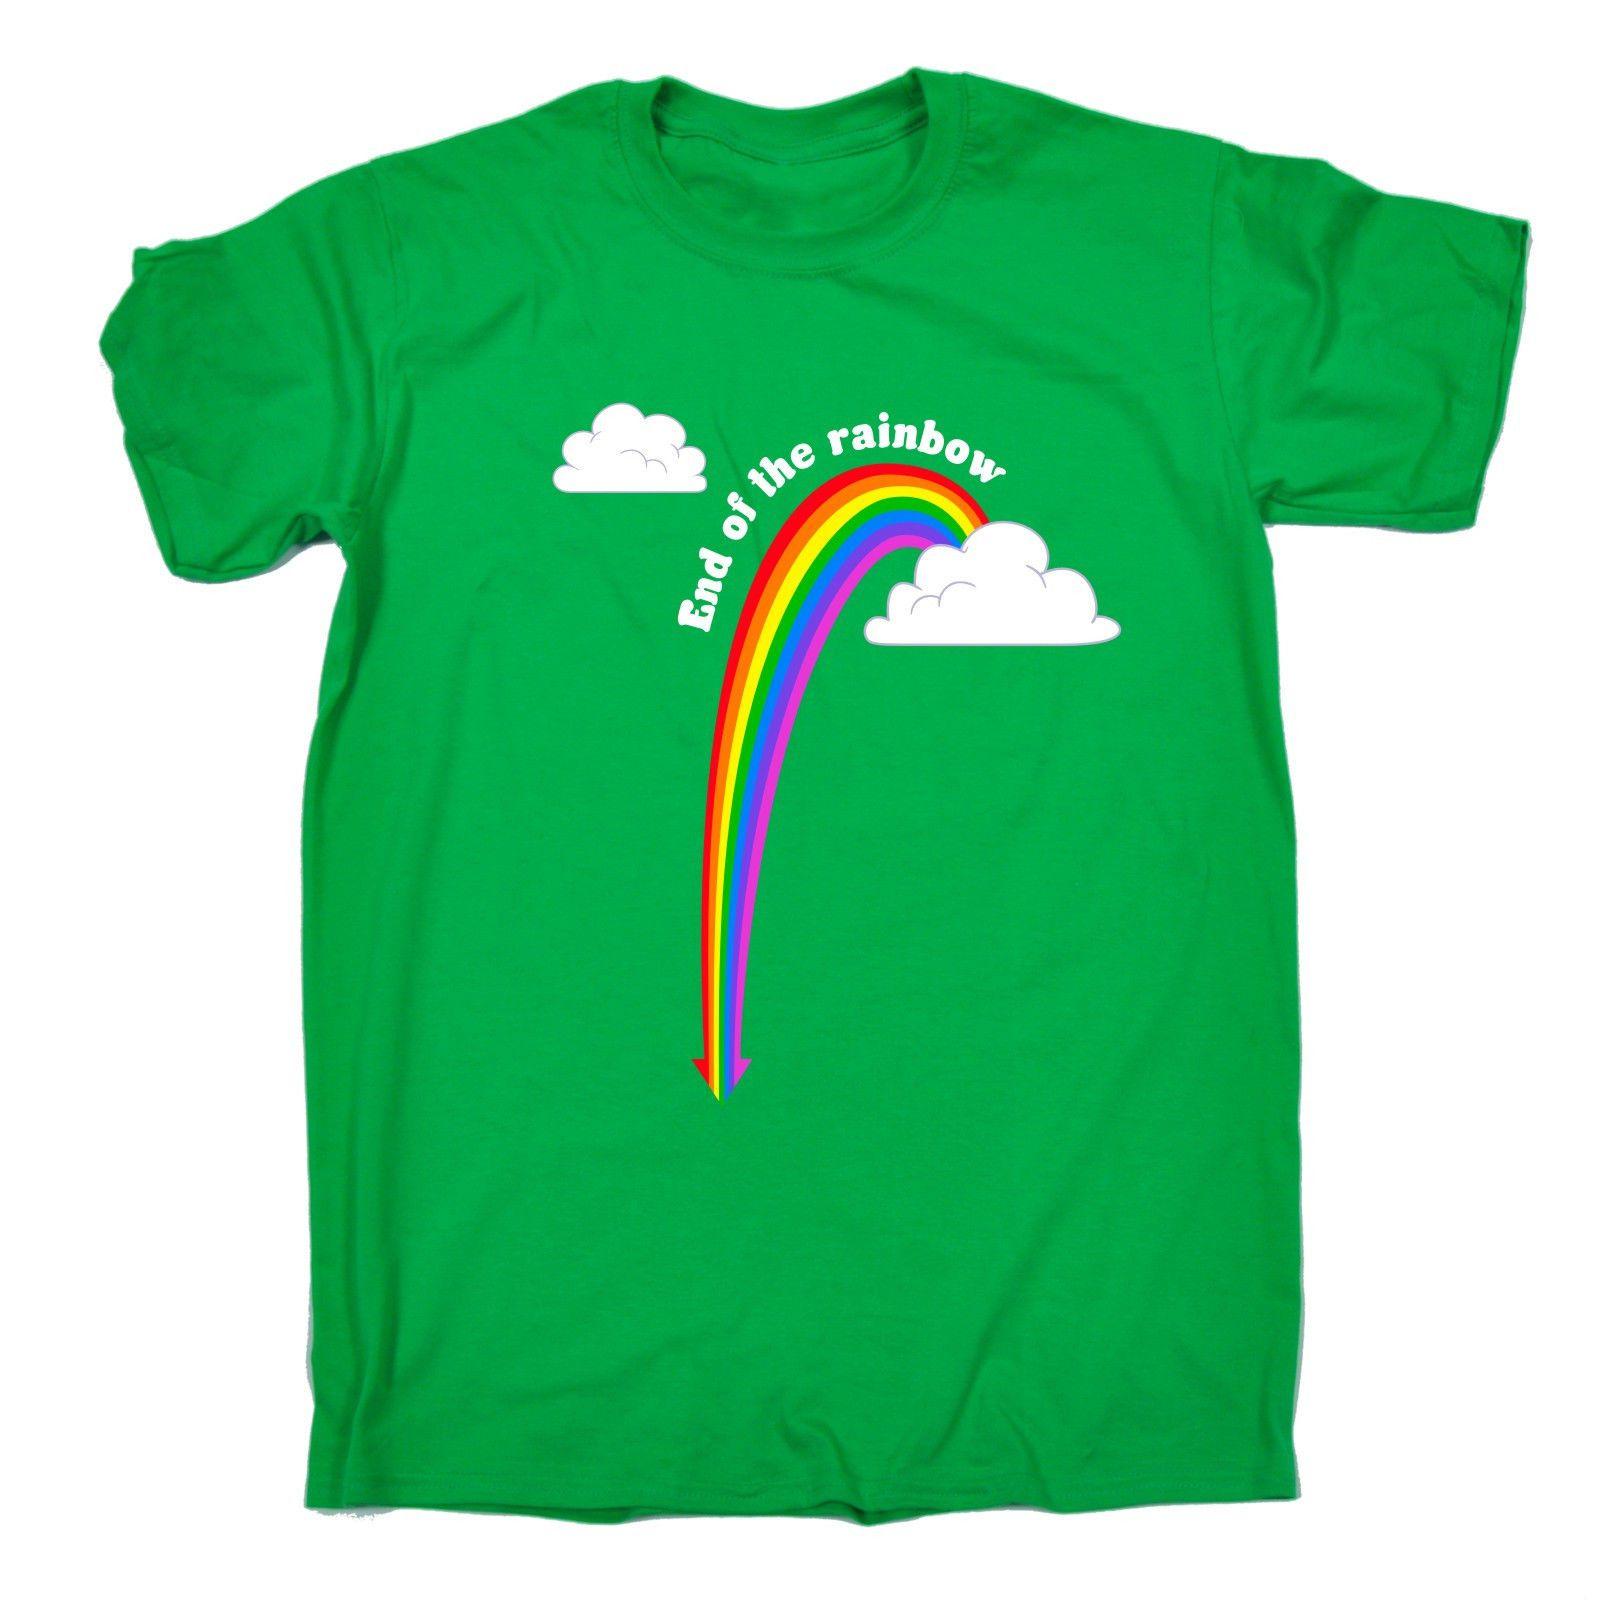 394dbffc6 End Of The Rainbow T SHIRT Tee Rude Funny Joke Offensive Birthday Fashion  Gift Men Women Unisex Fashion Tshirt Cool Tee Shirts Cheap Business Tee  Shirts ...